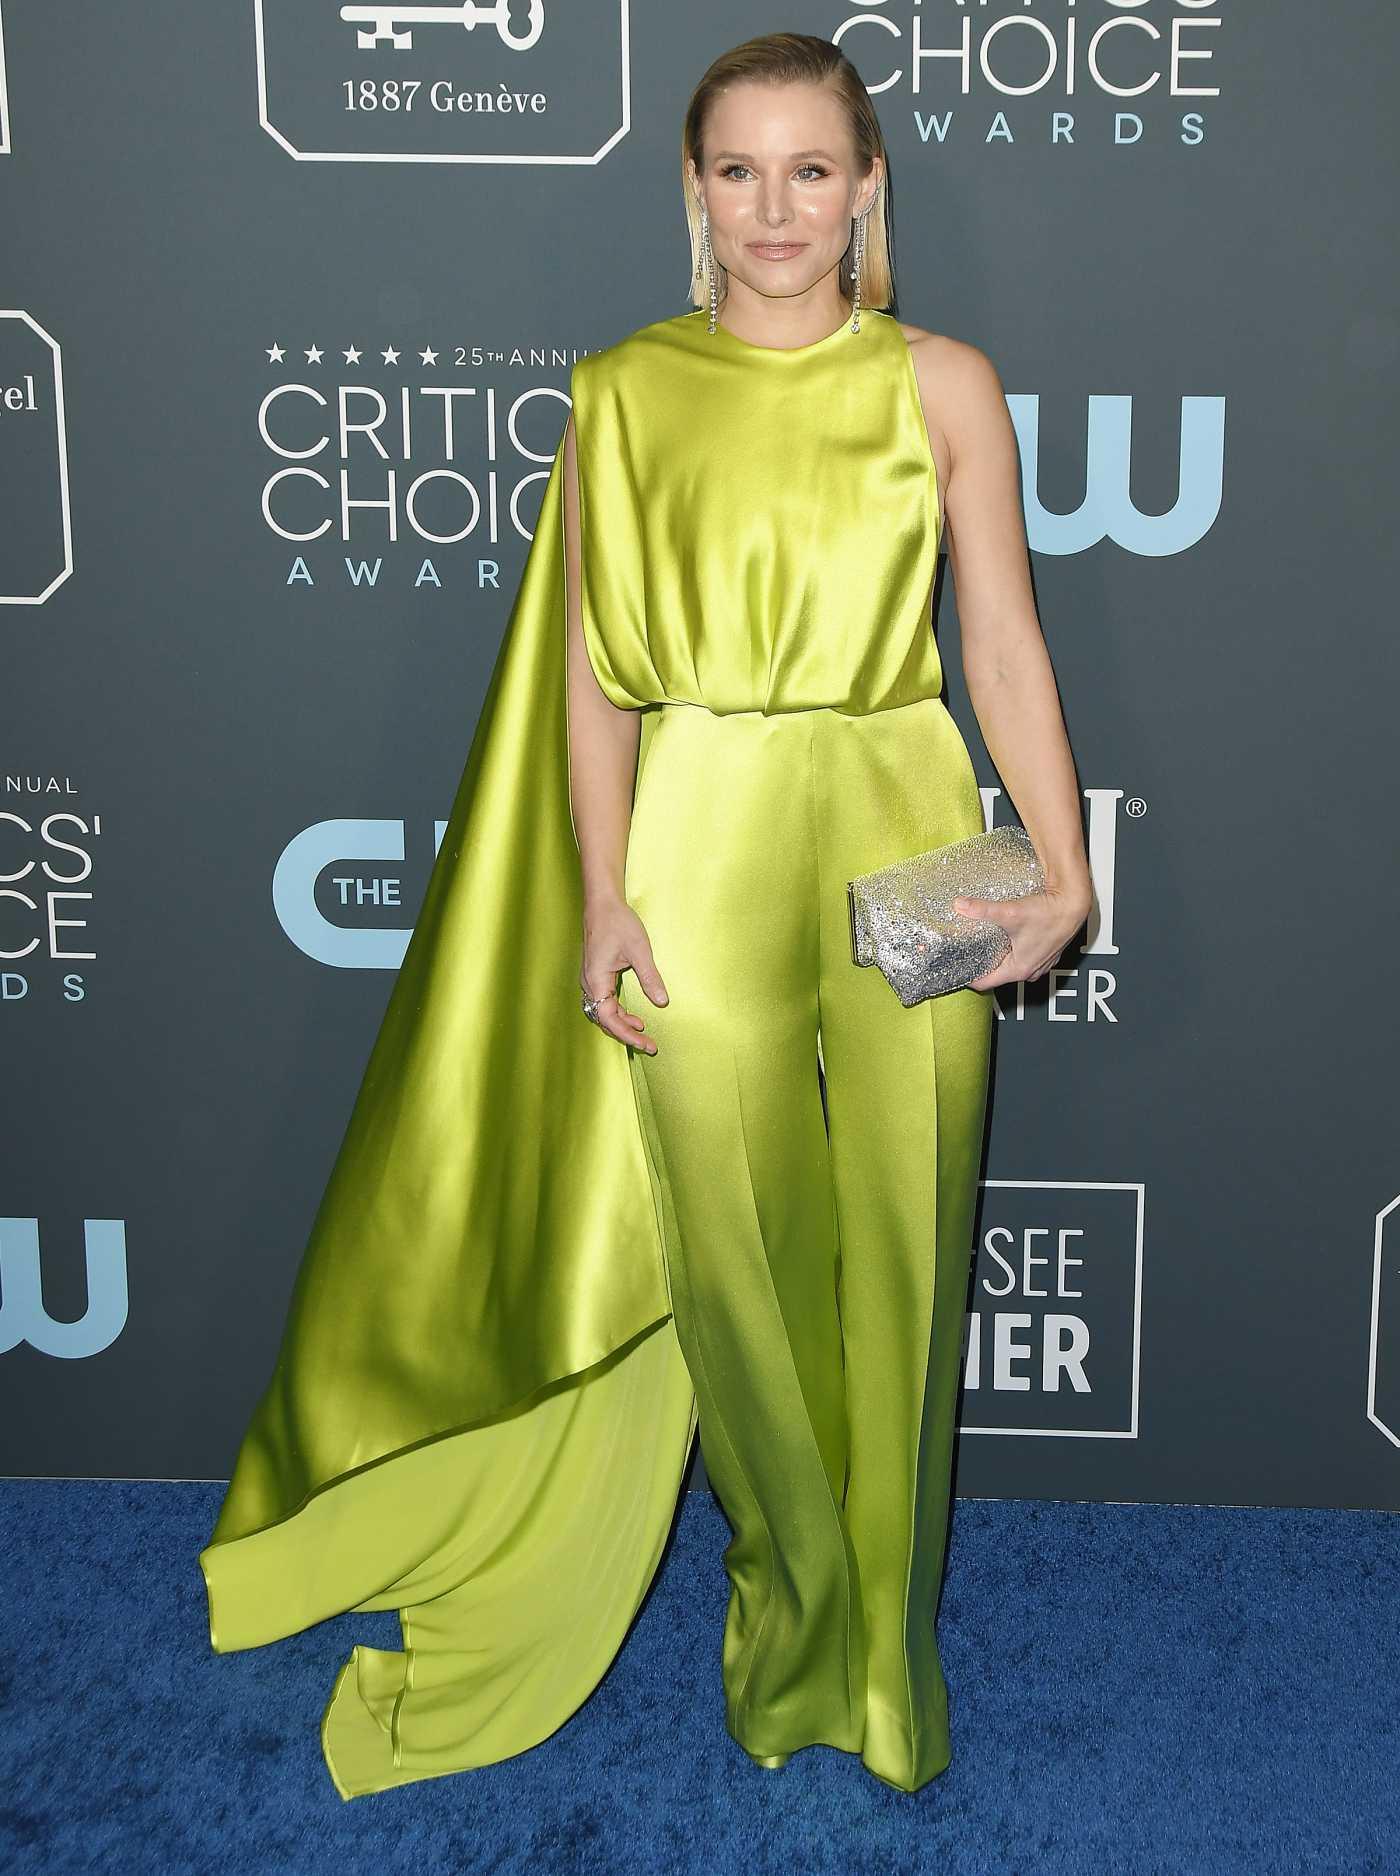 Kristen Bell Attends the 25th Annual Critics Choice Awards in Santa Monica 01/12/2020